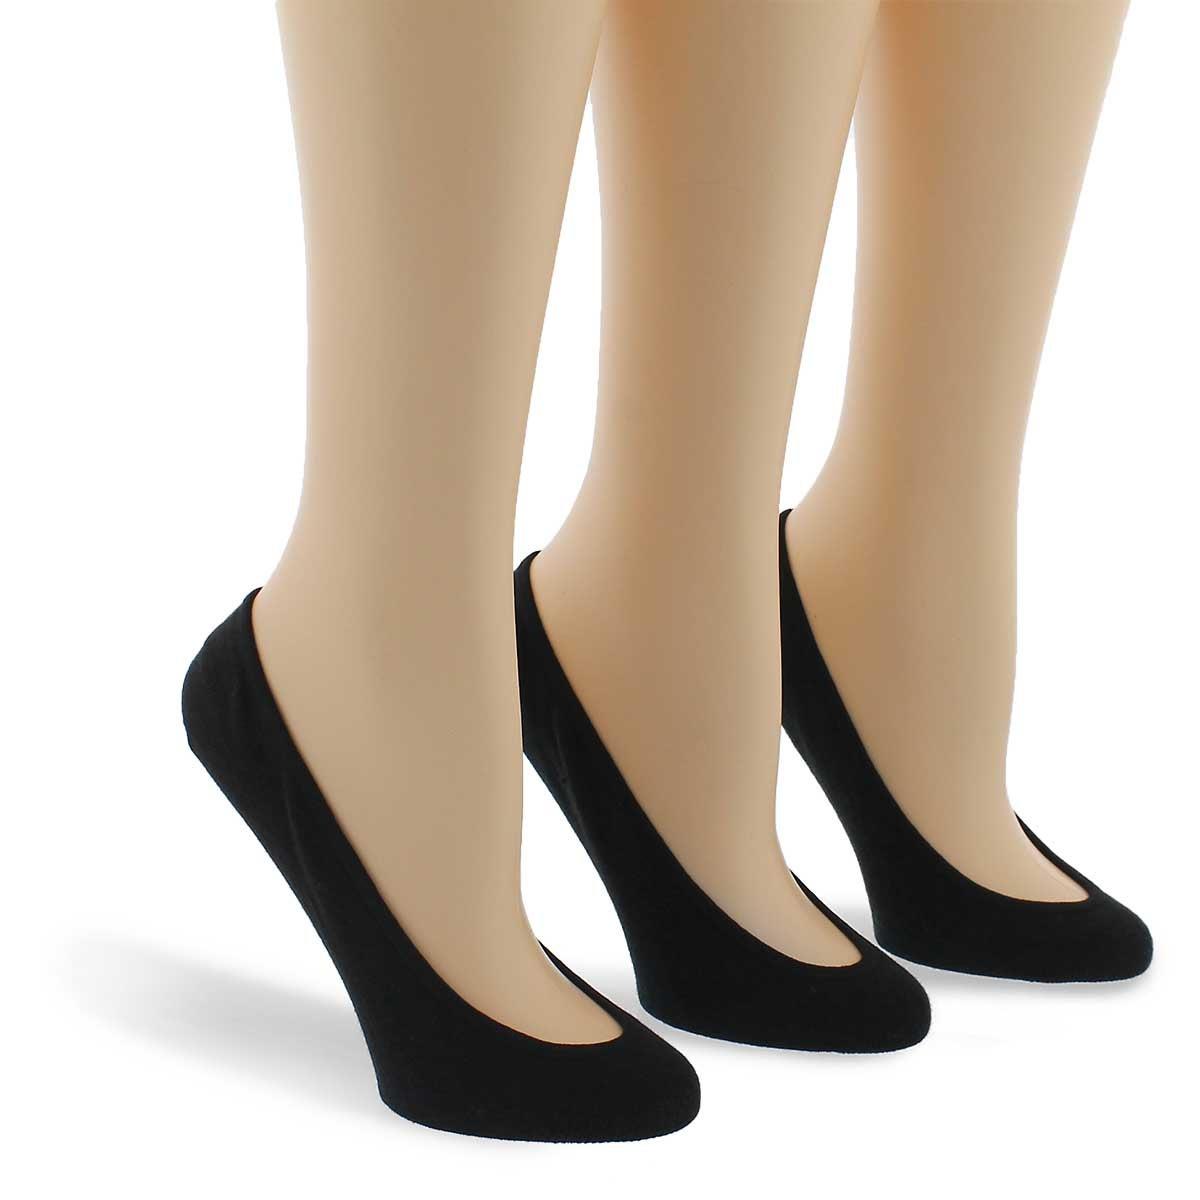 Women's SEASONLESS CORE black liners - 3pk